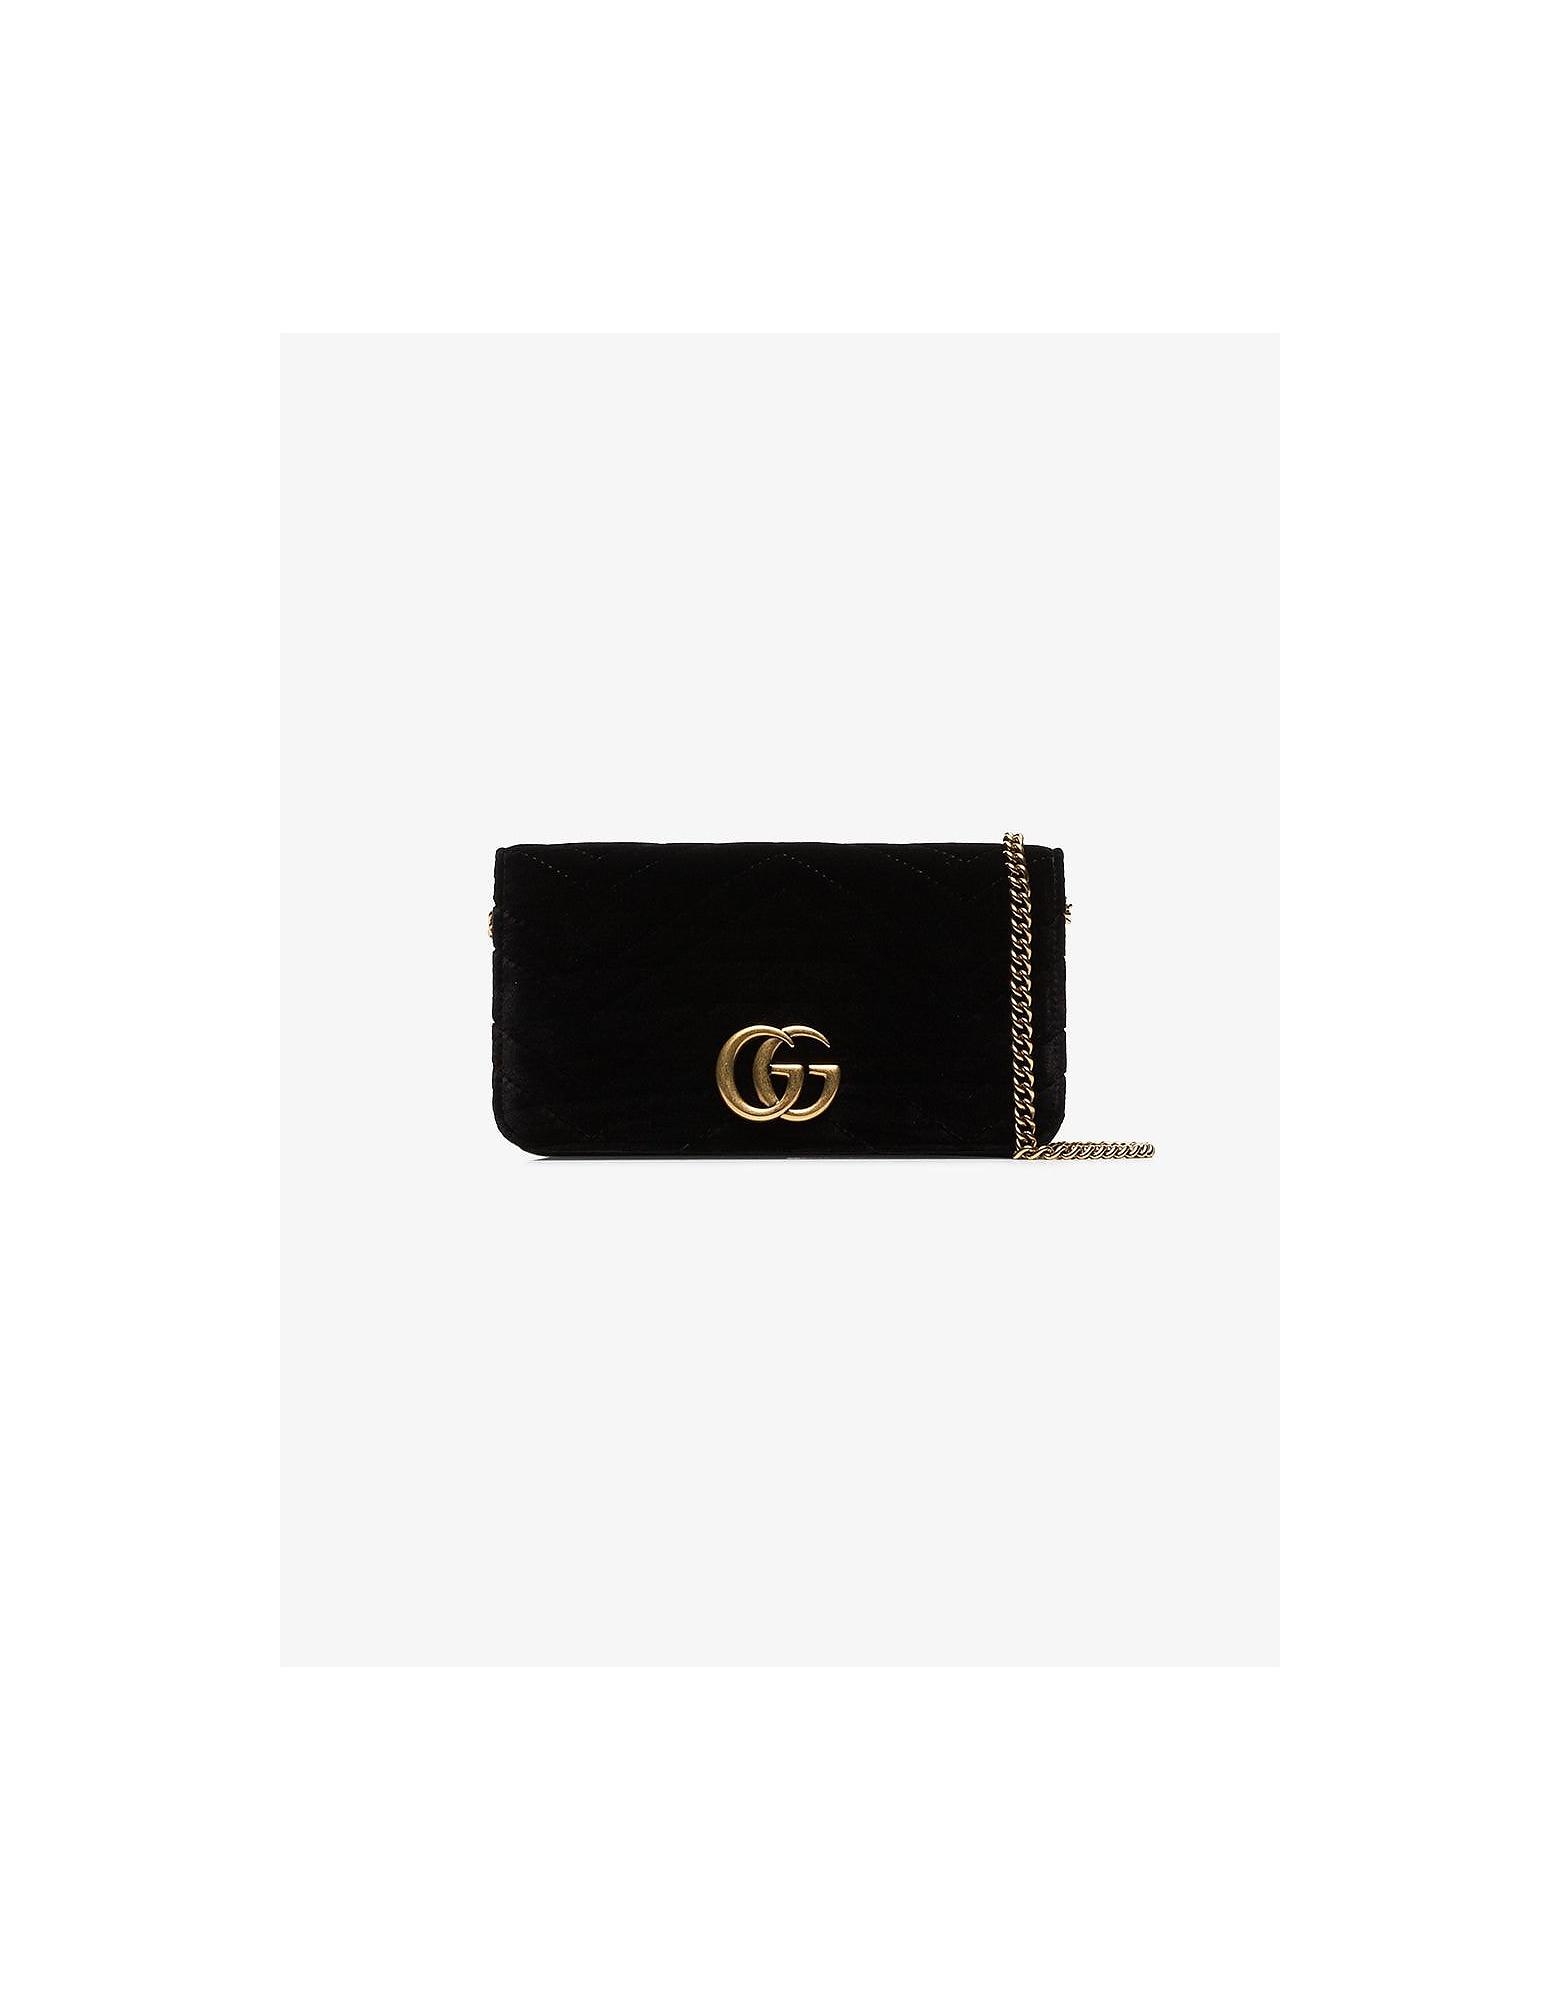 Gucci Designer Handbags, Black marmont chevron velvet clutch